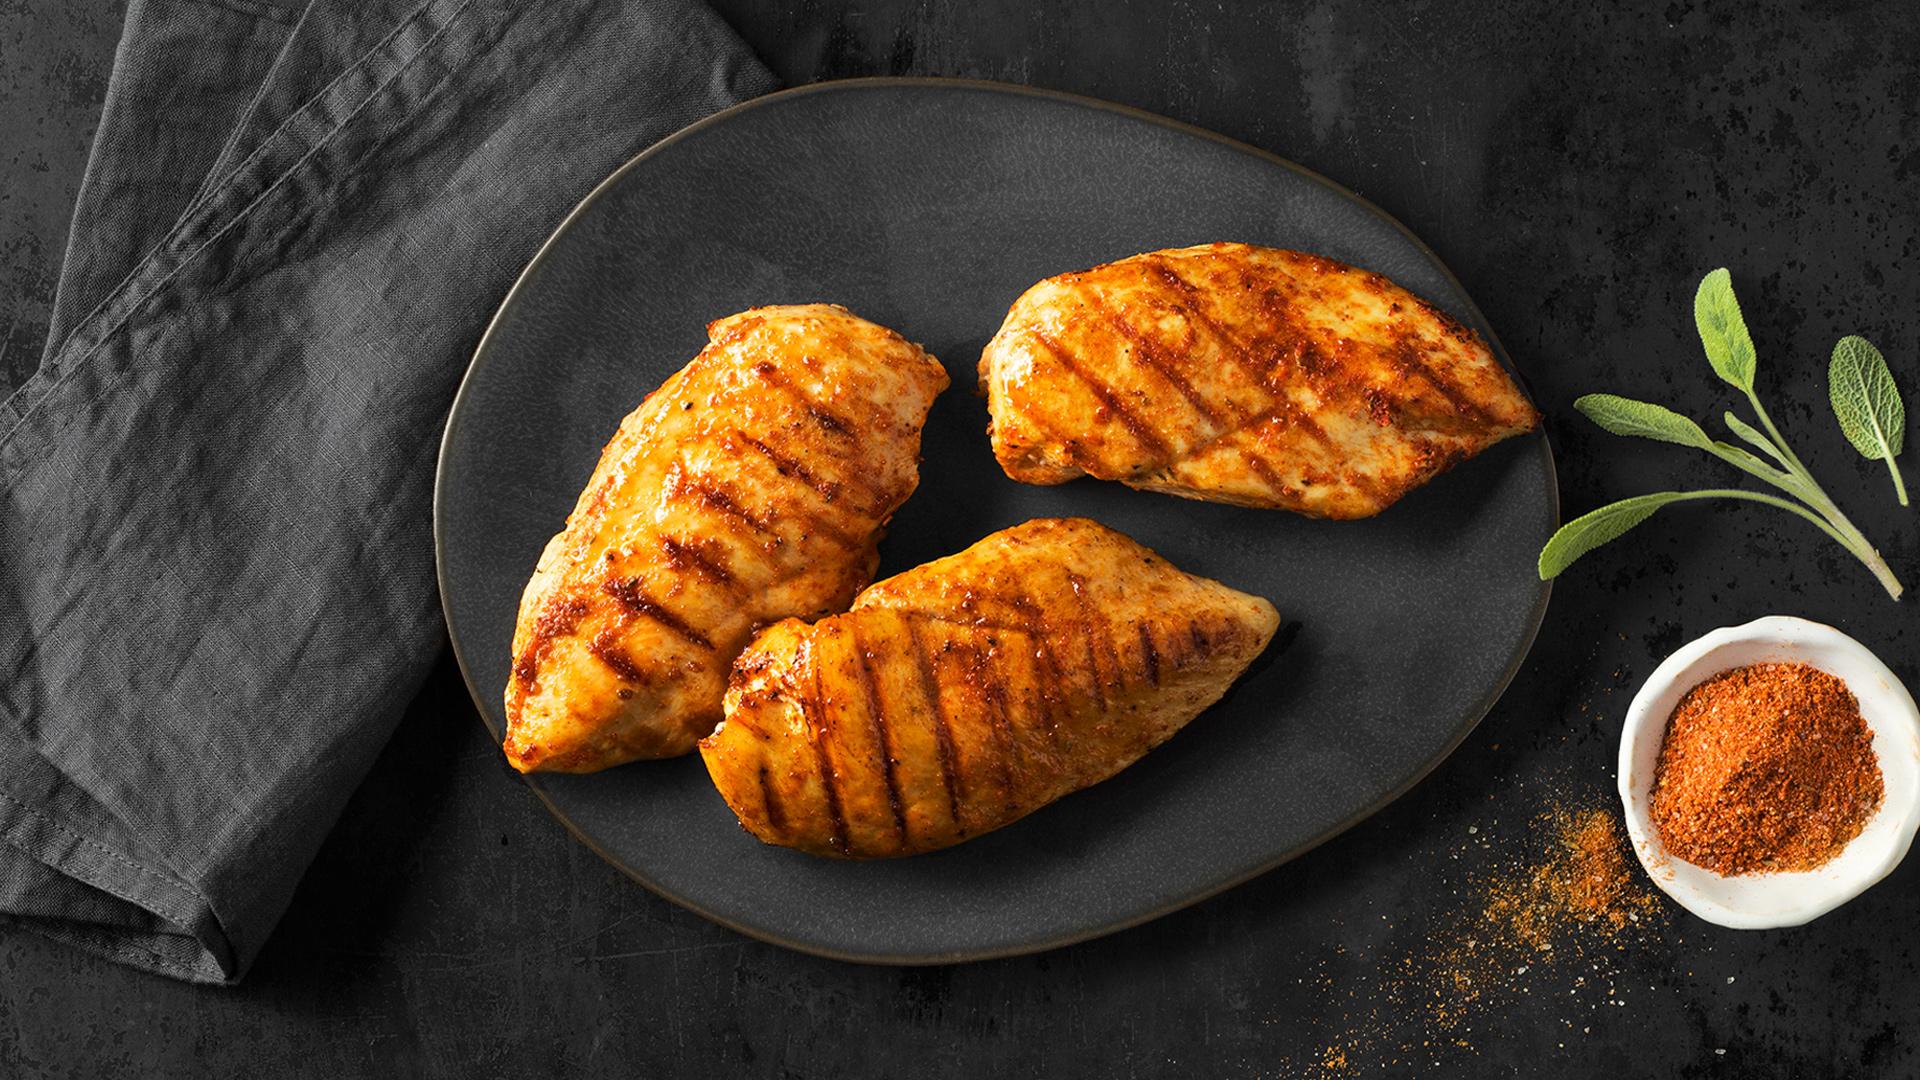 Hühnerbrust grillen Contentbild